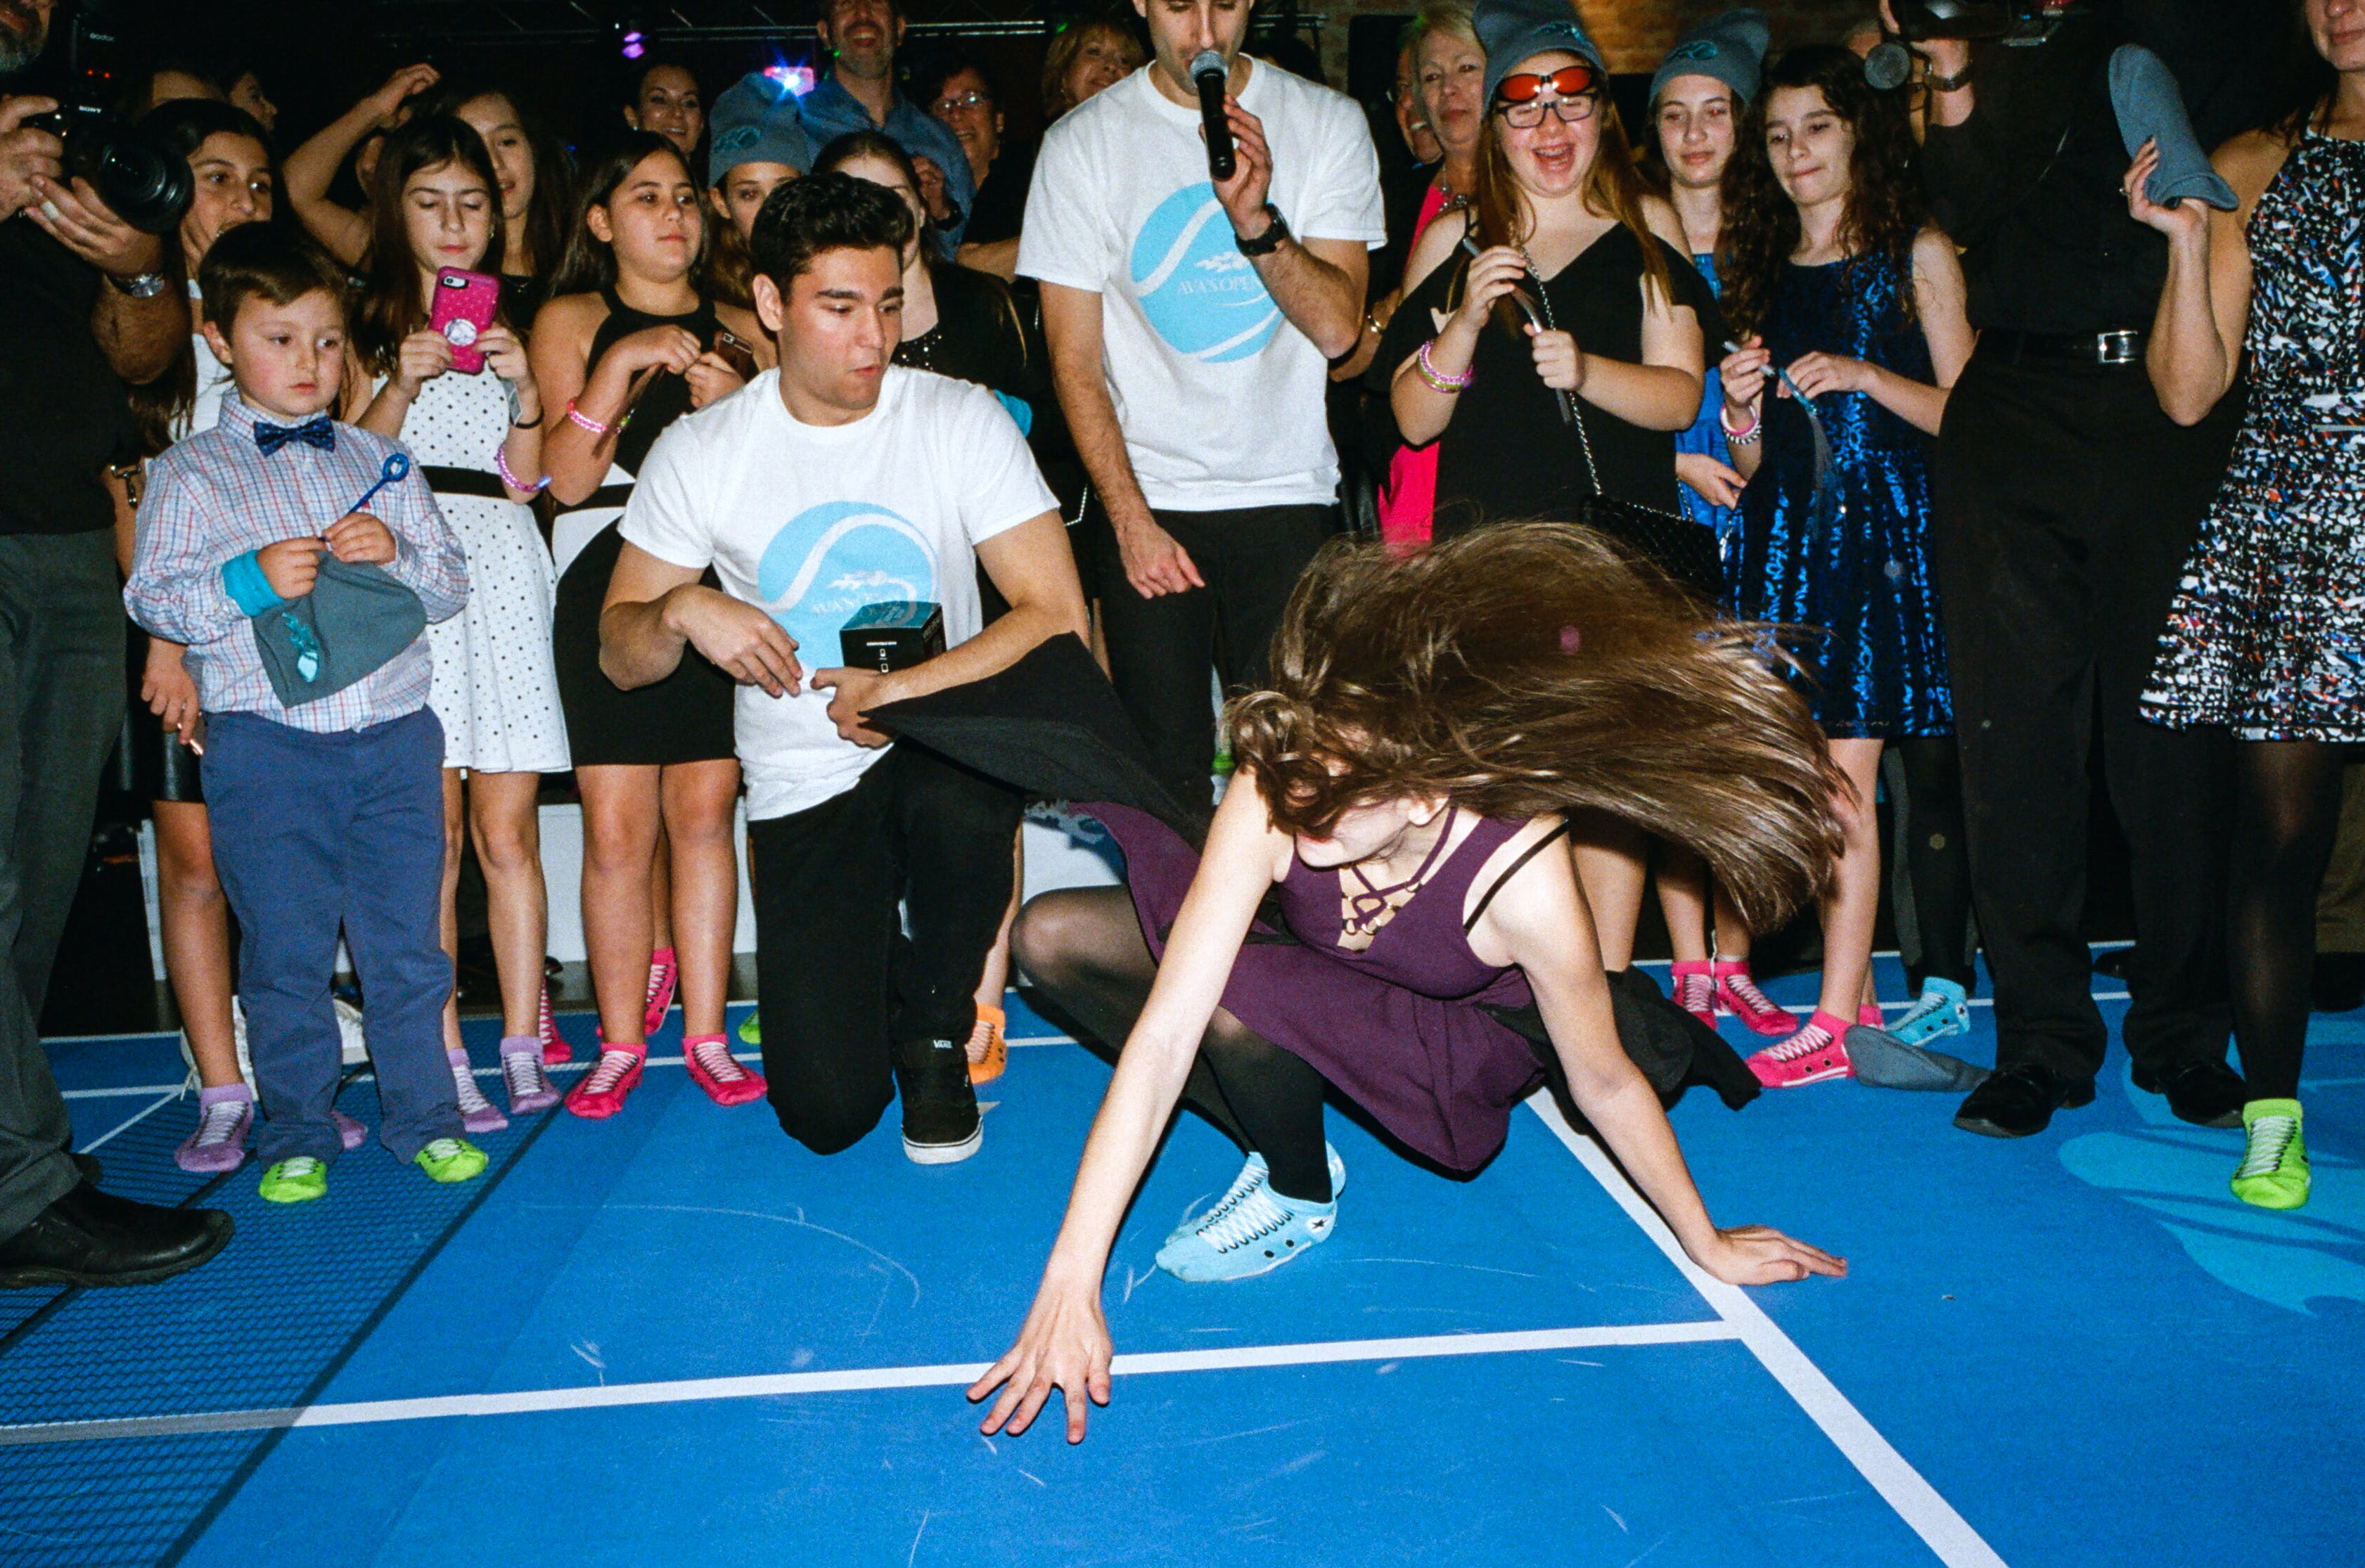 DJ Zap crowds the floor with an impromptu-feeling dance battle.